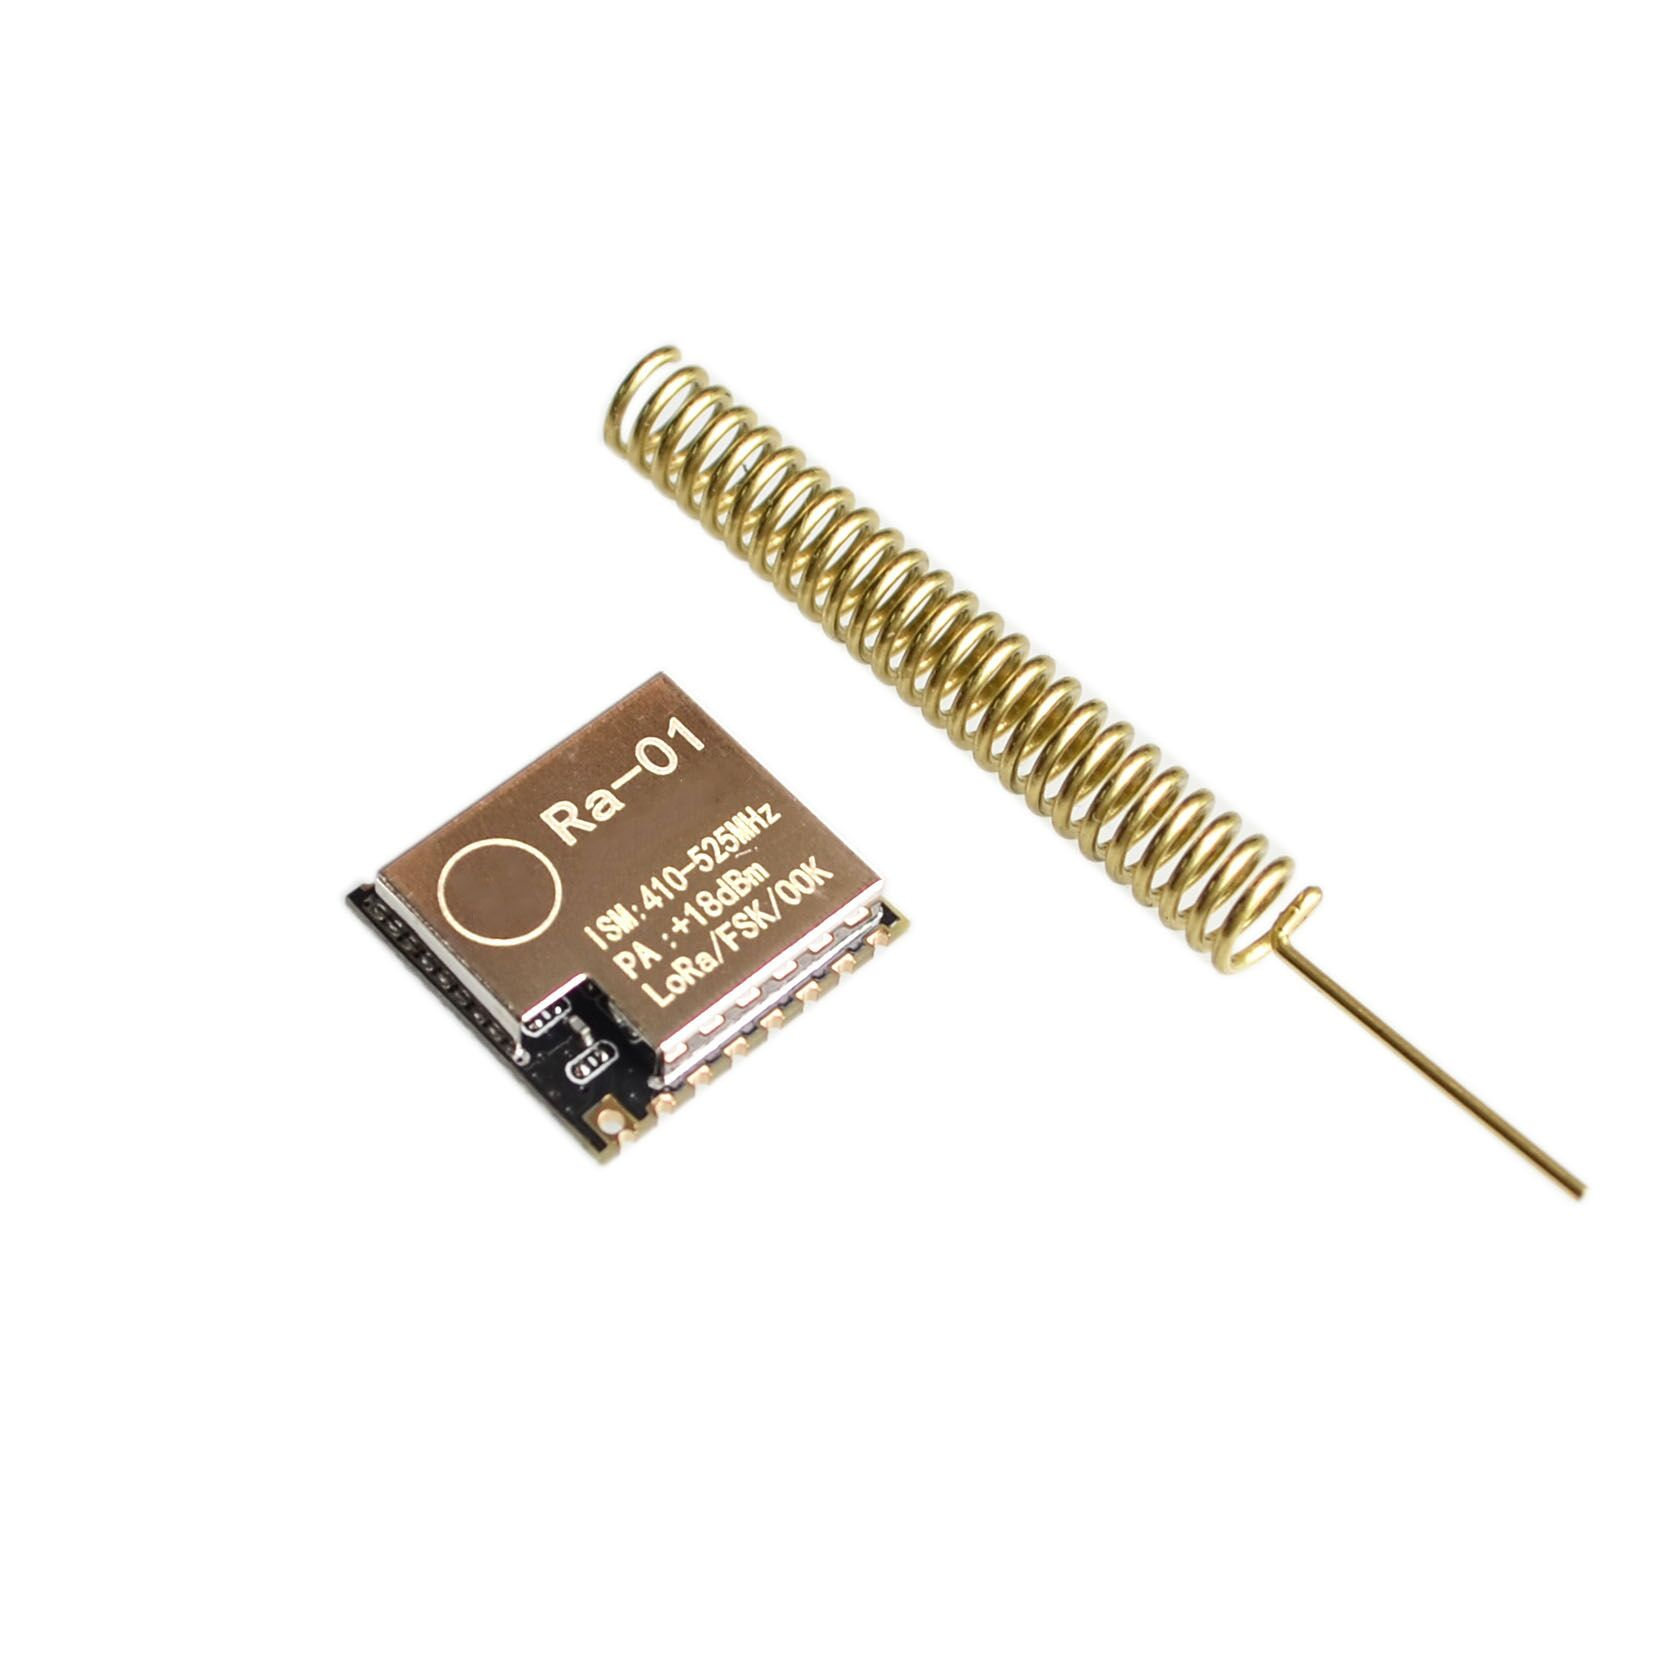 10PCS LOT Ra 01 LoRa SX1278 433M Wireless Spread Spectrum Transmission Module Most Distant 10KM